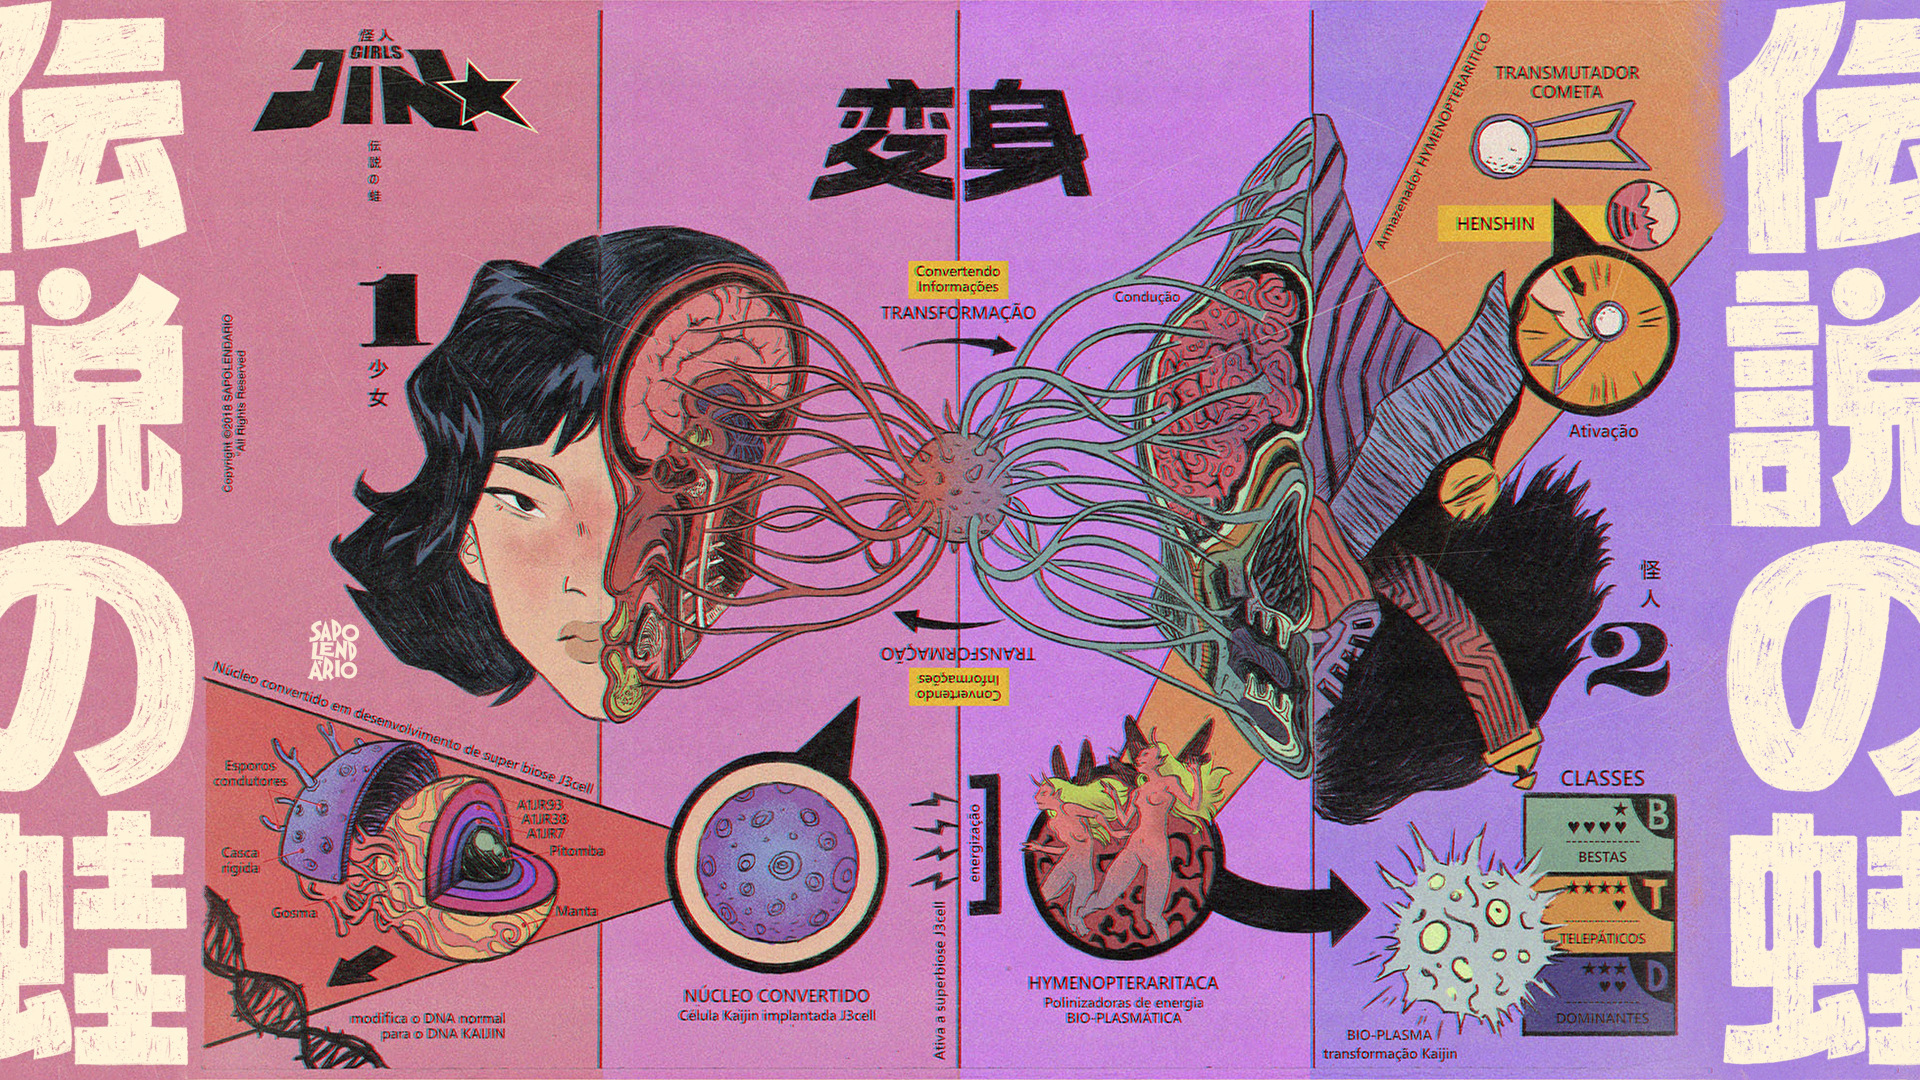 Graphic design by Sapo Lendario